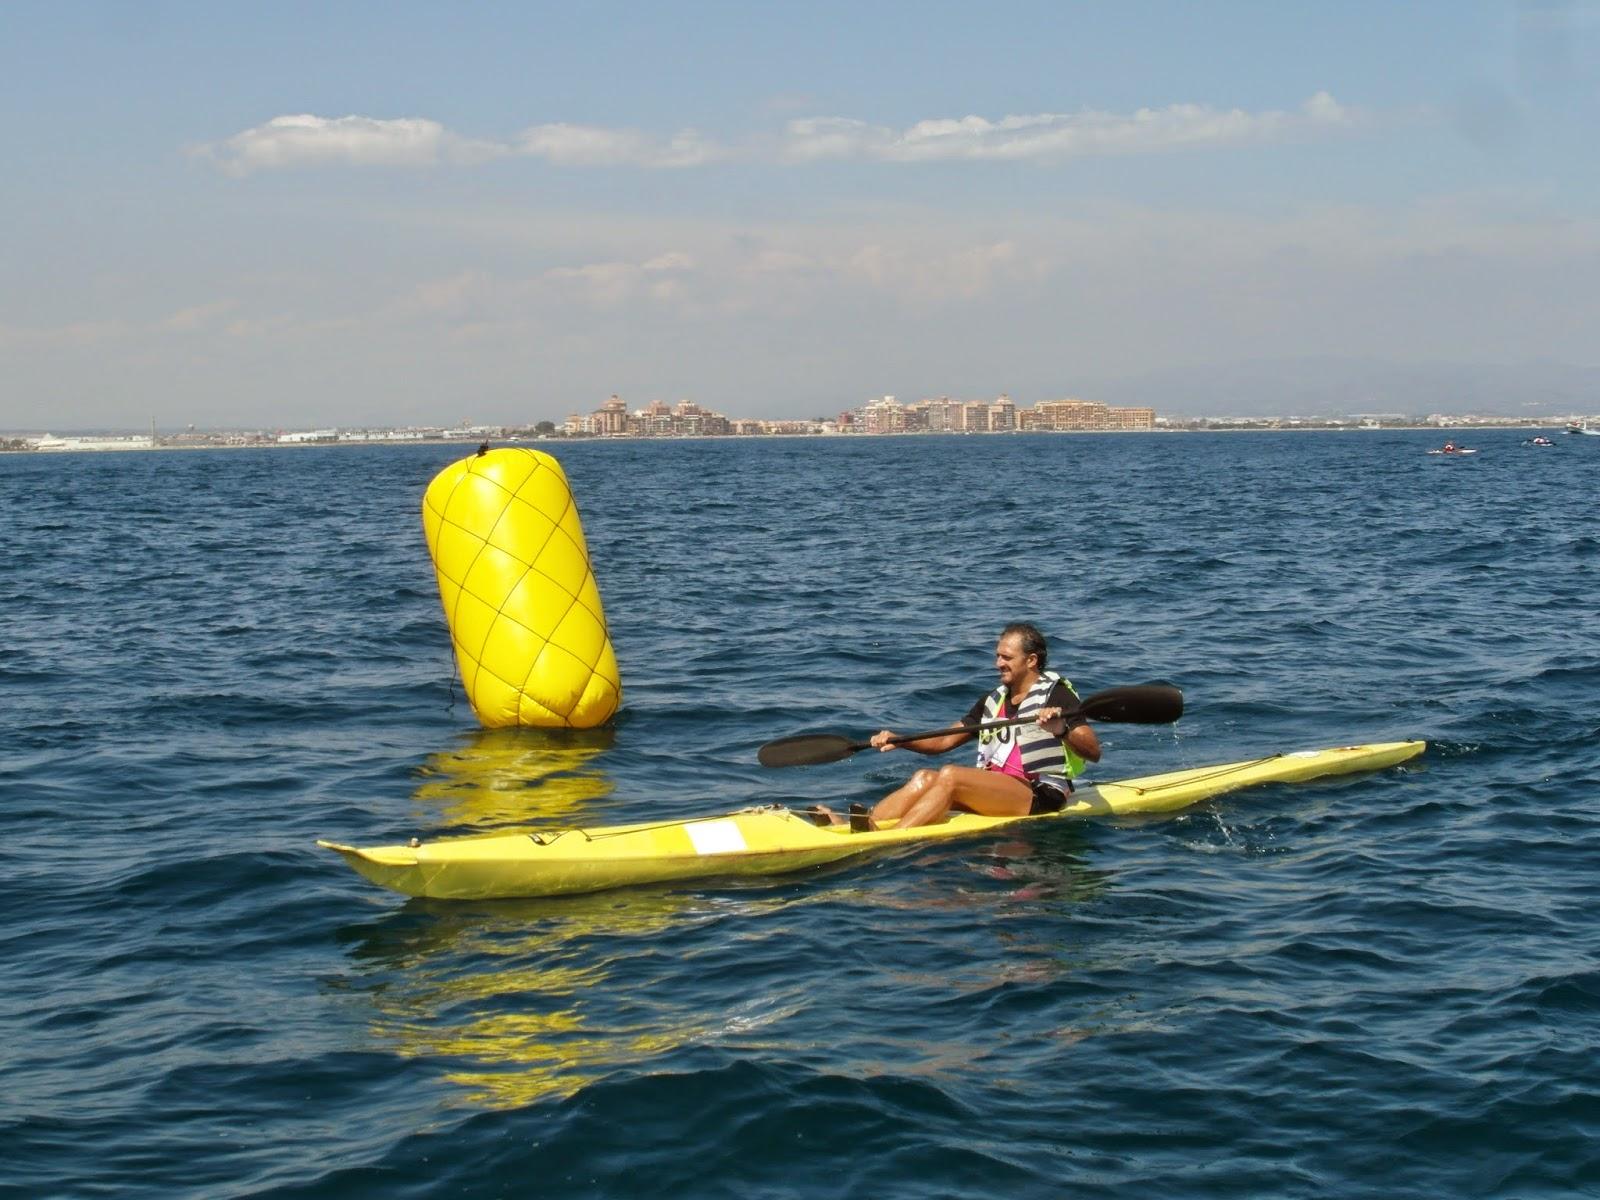 Club pirag isme silla club kayak de mar pobla marina for Sillas para kayak